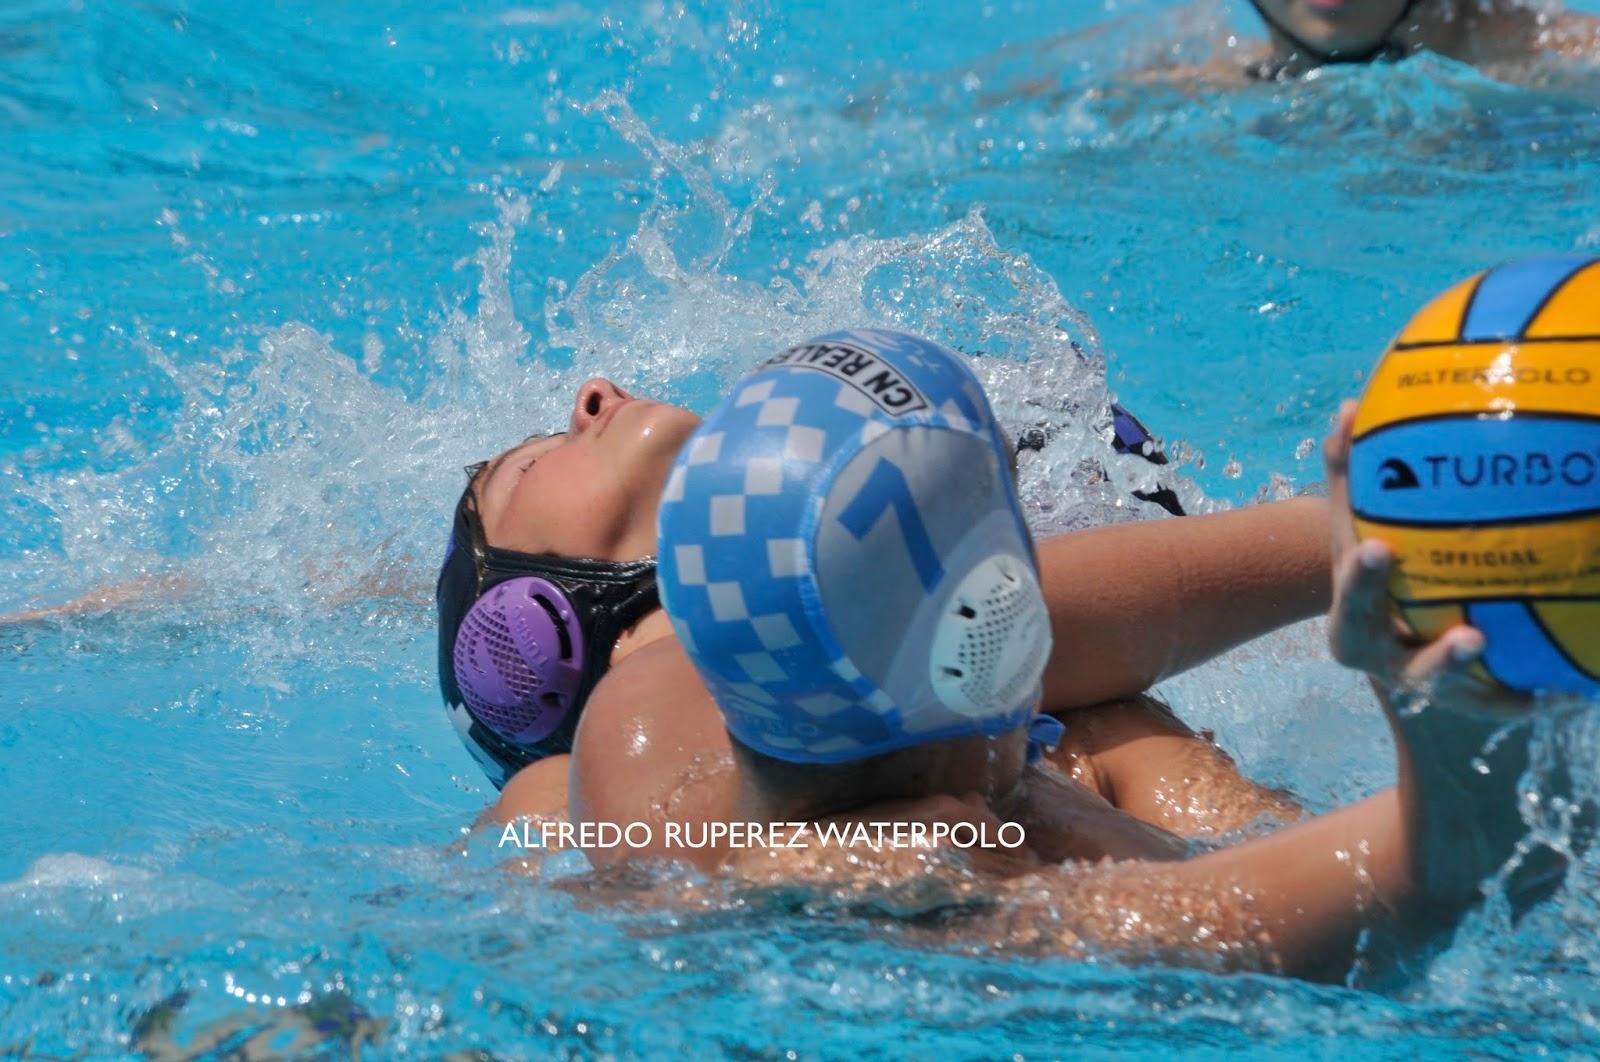 Alfredo ruperez waterpolo ligas regionales de waterpolo for Piscina julio navarro